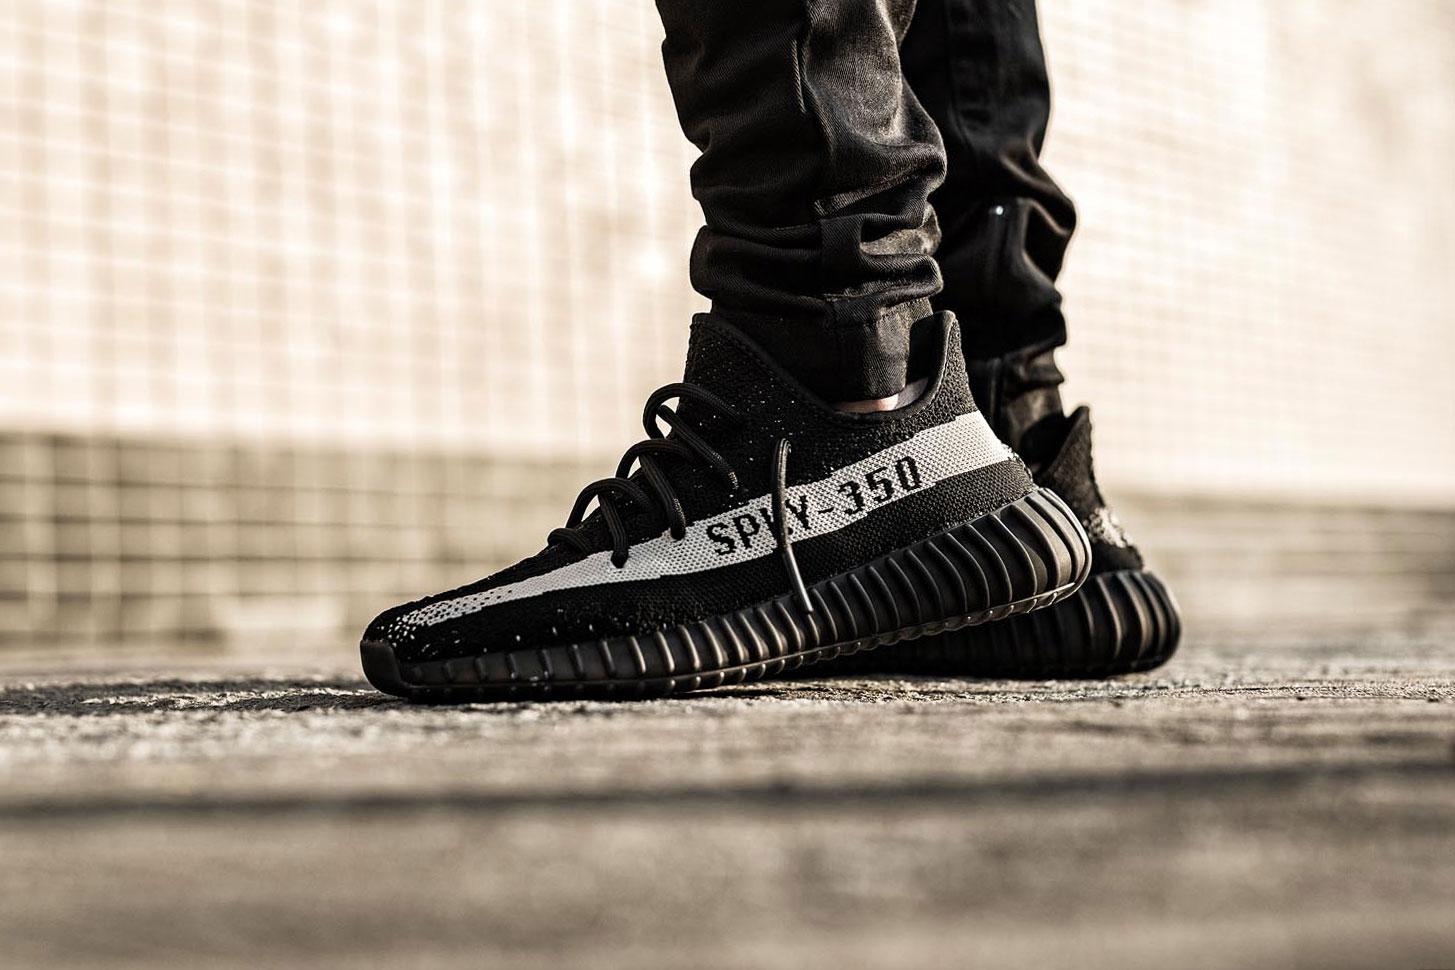 adidas yeezy boost 350 black pirate rechnung adidas nmd for sale footlocker